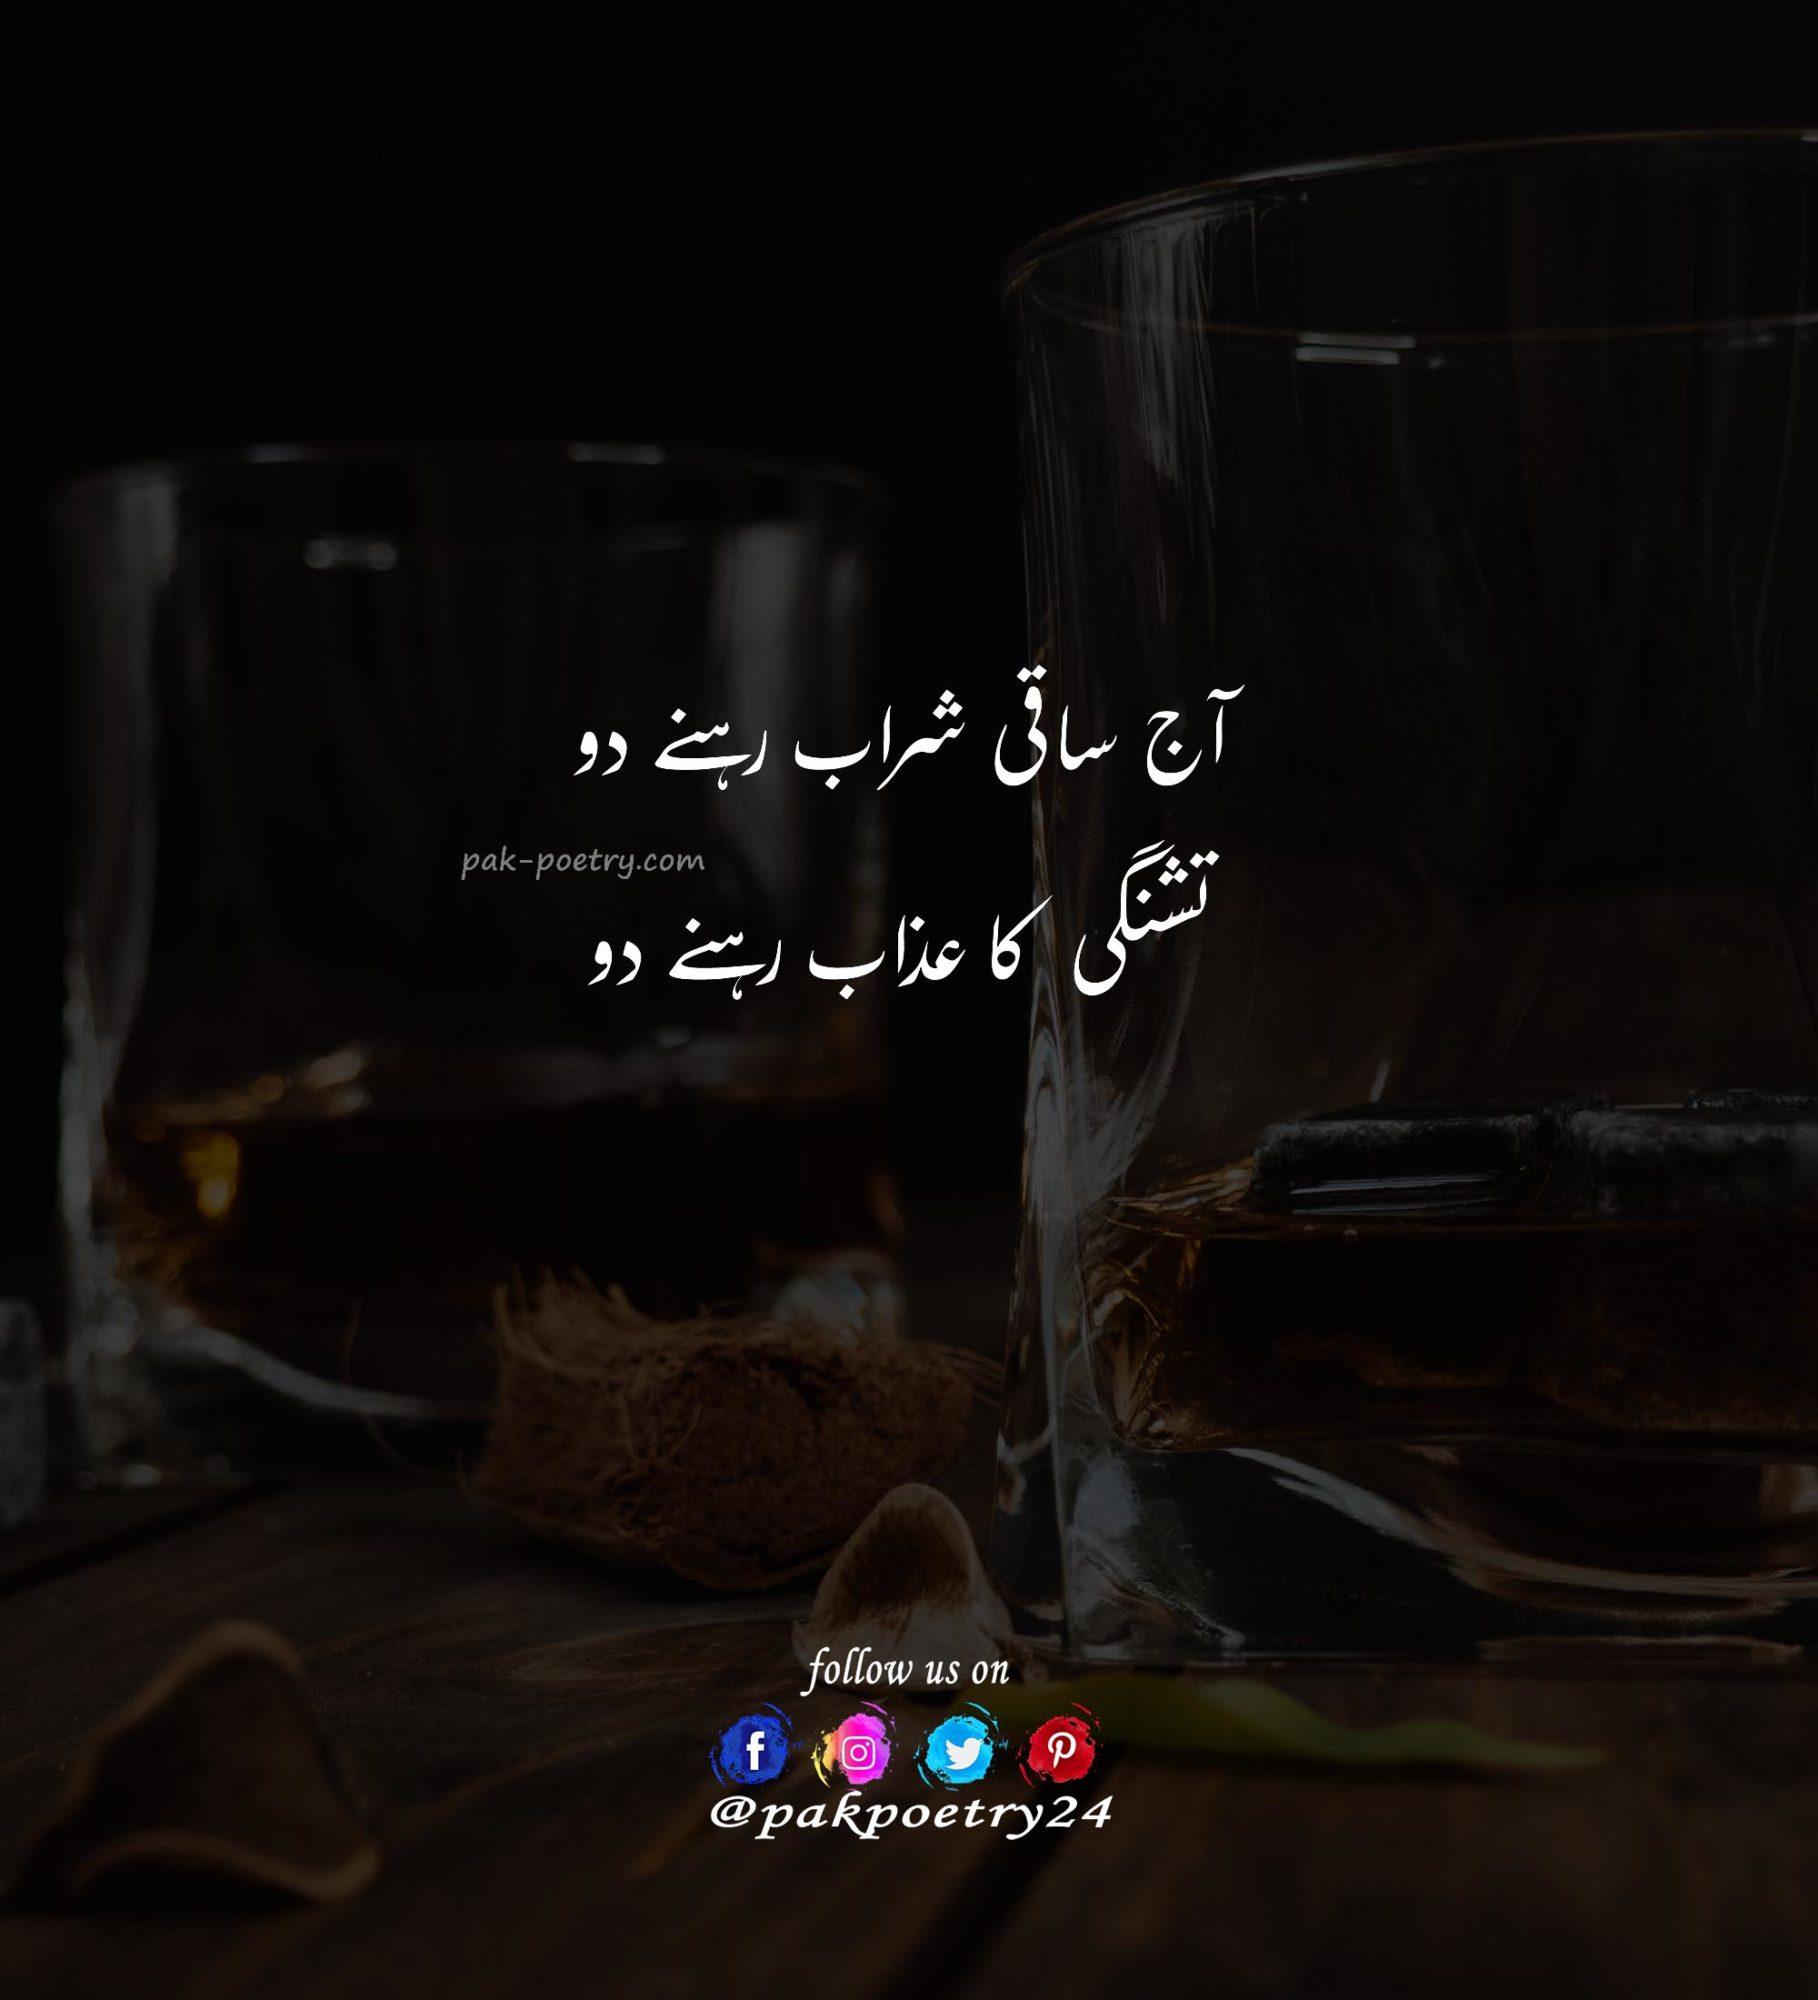 urdu poetry, poetry in urdu, poetry urdu, poetry, urdu shayari, potry in urdu, baat poetry, poetry.in.urdu, urdu poetry pic, poetry into urdu, urdu. poetry, porty urdu, urdu pietry, sad poetry, poetry, sad poetry in urdu, poetry sad, urdu sad poetry, sad poetry urdu, sad poetry pics, urdu poetry sad, poetry in urdu sad, poetry urdu sad, sad poetry images, sad.poetry, sad poetry pic, sad potery, sad potry, sad peotry, sad poetry image, sadpoetry,